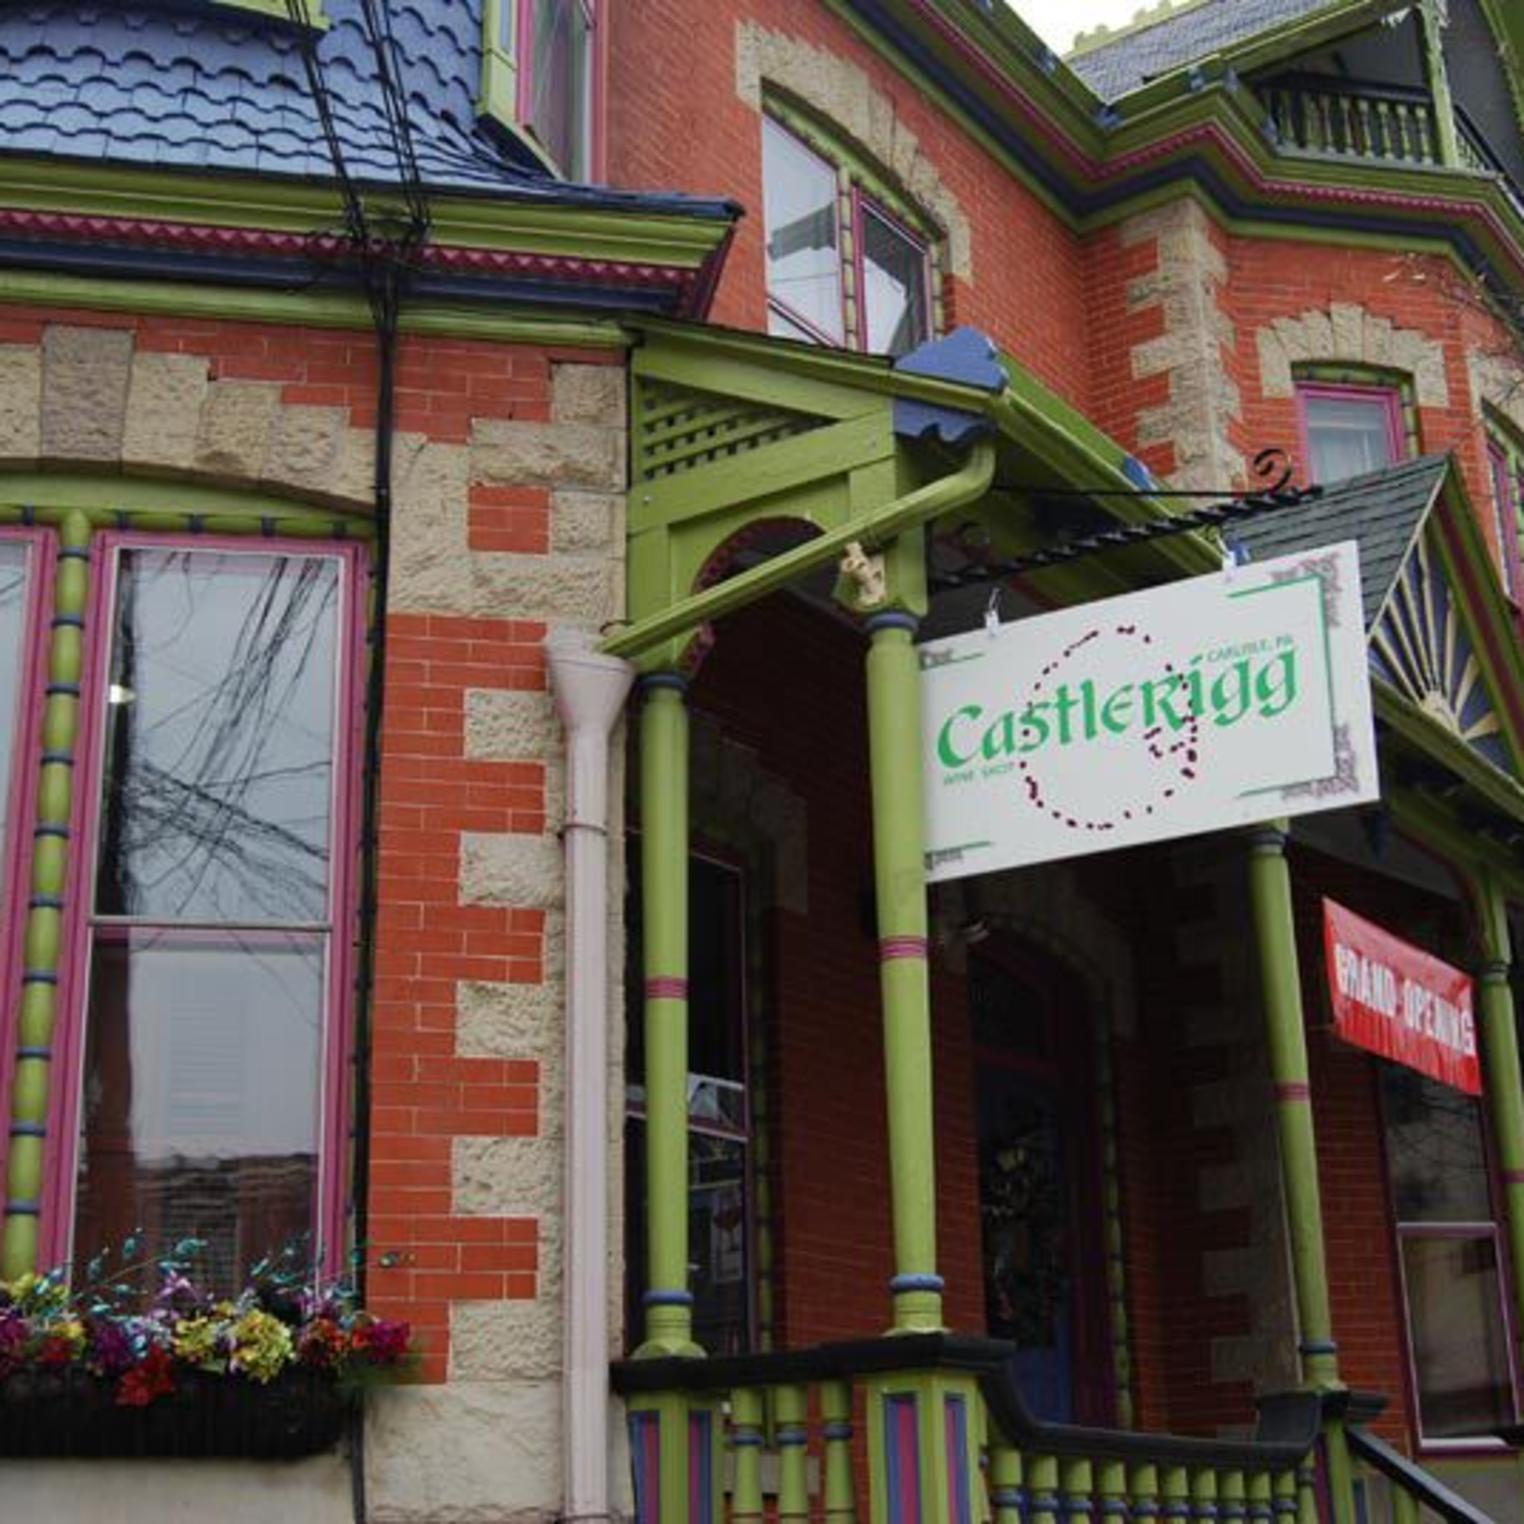 Castlerigg Wine Shop Exterior